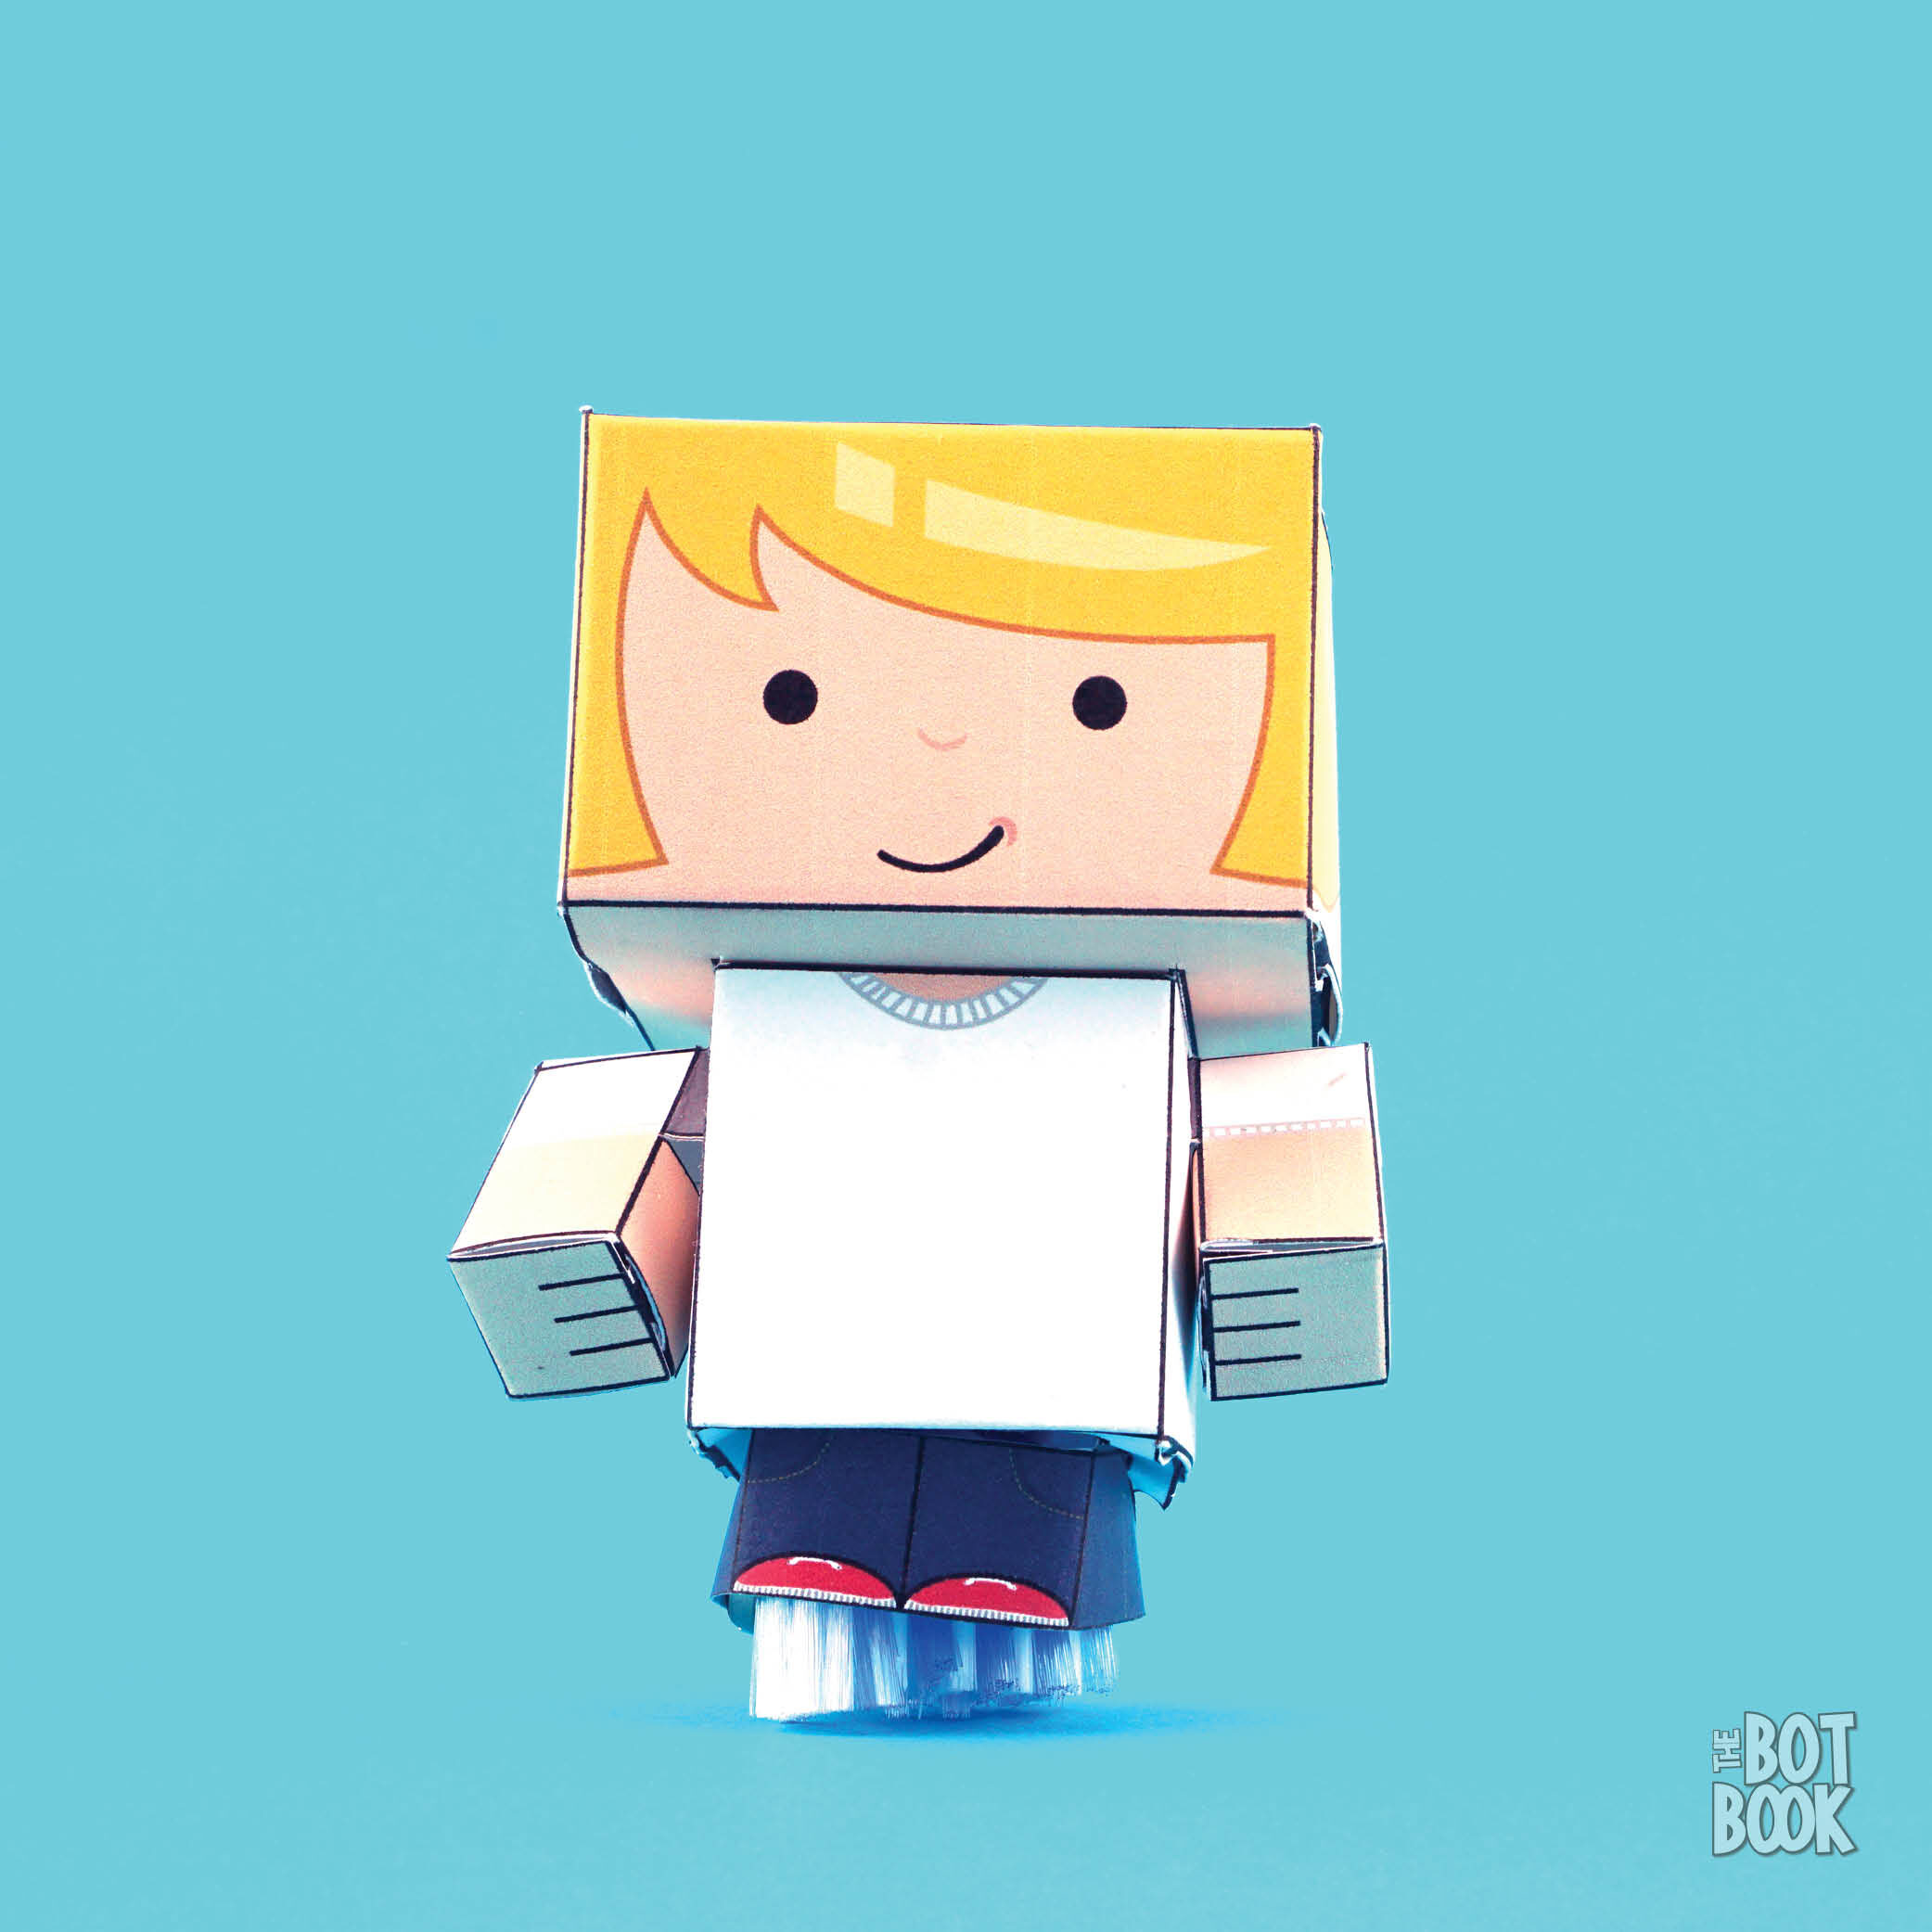 3-D Paper Toy Bot 2000x2000